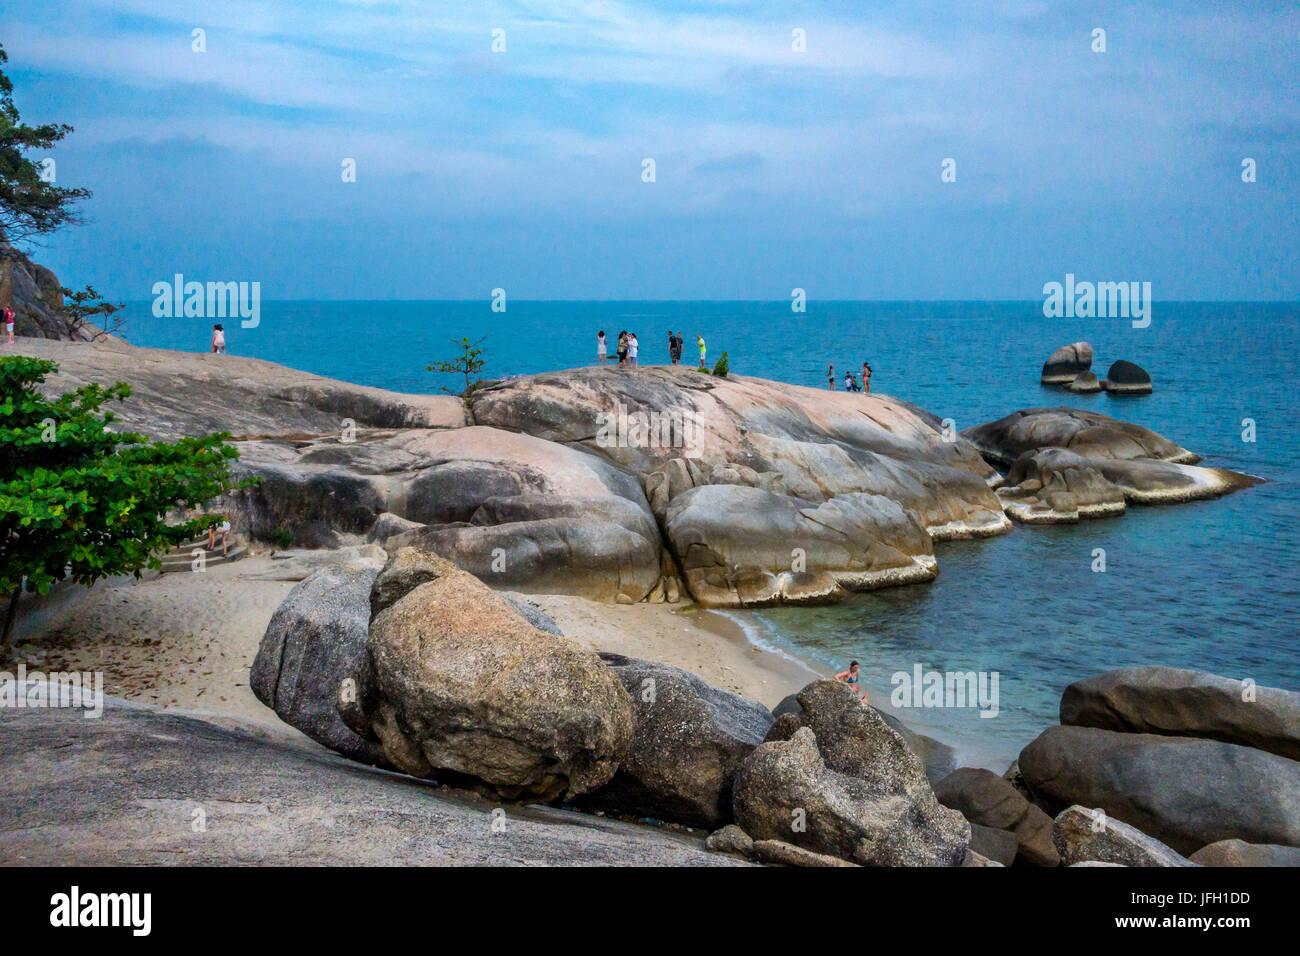 There Ta and There Yai rocks, Grand of rock, Lamai Beach, island Ko Samui, Thailand, Asia - Stock Image